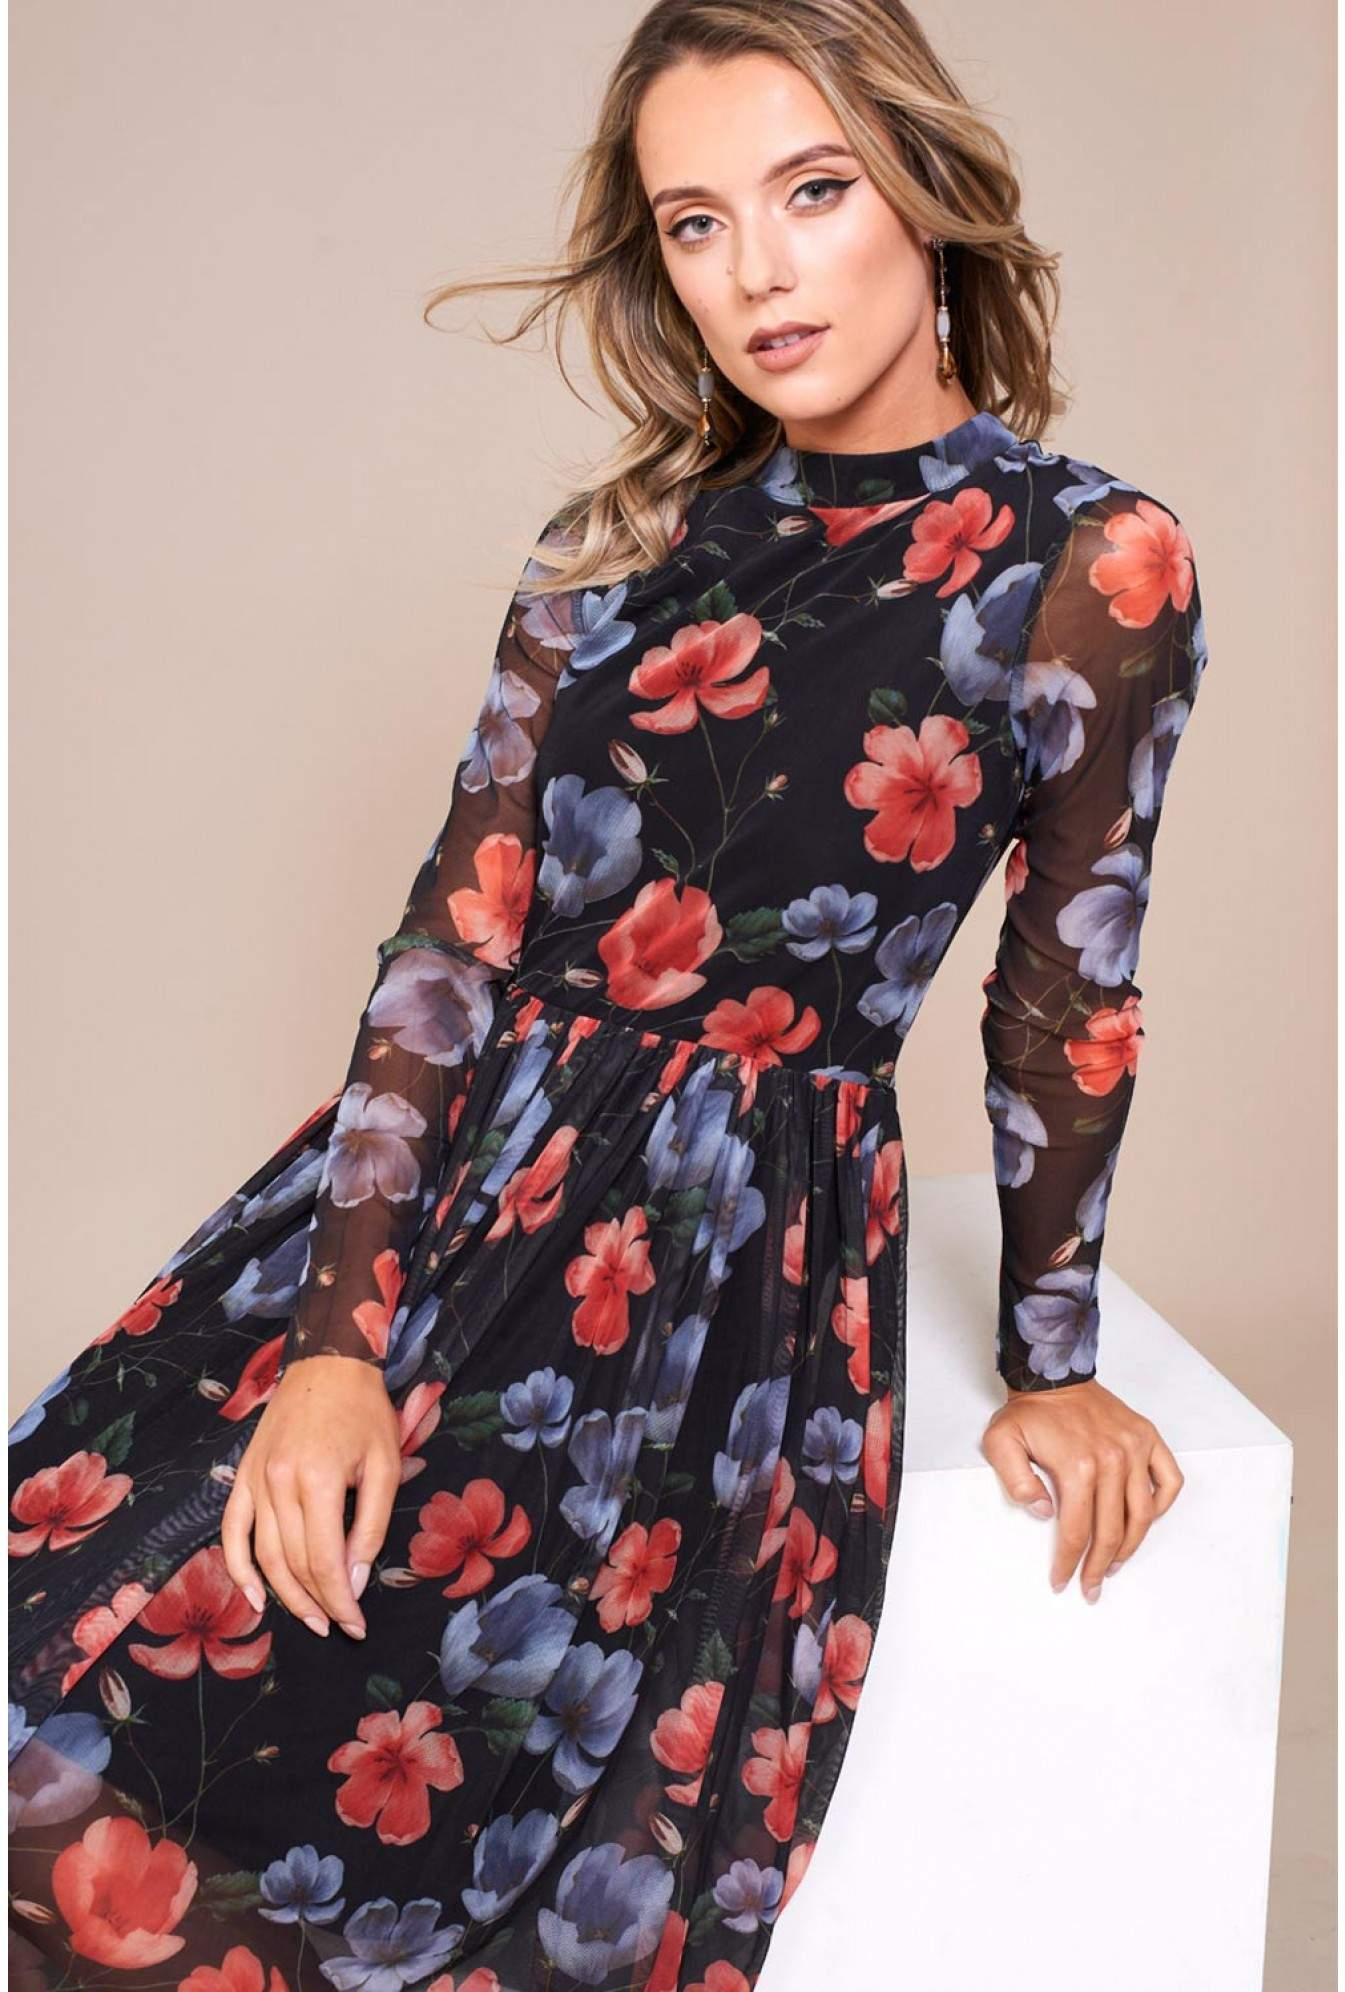 534481336 Stella Irvette Pleated Midi Dress in Black Floral Print   iCLOTHING